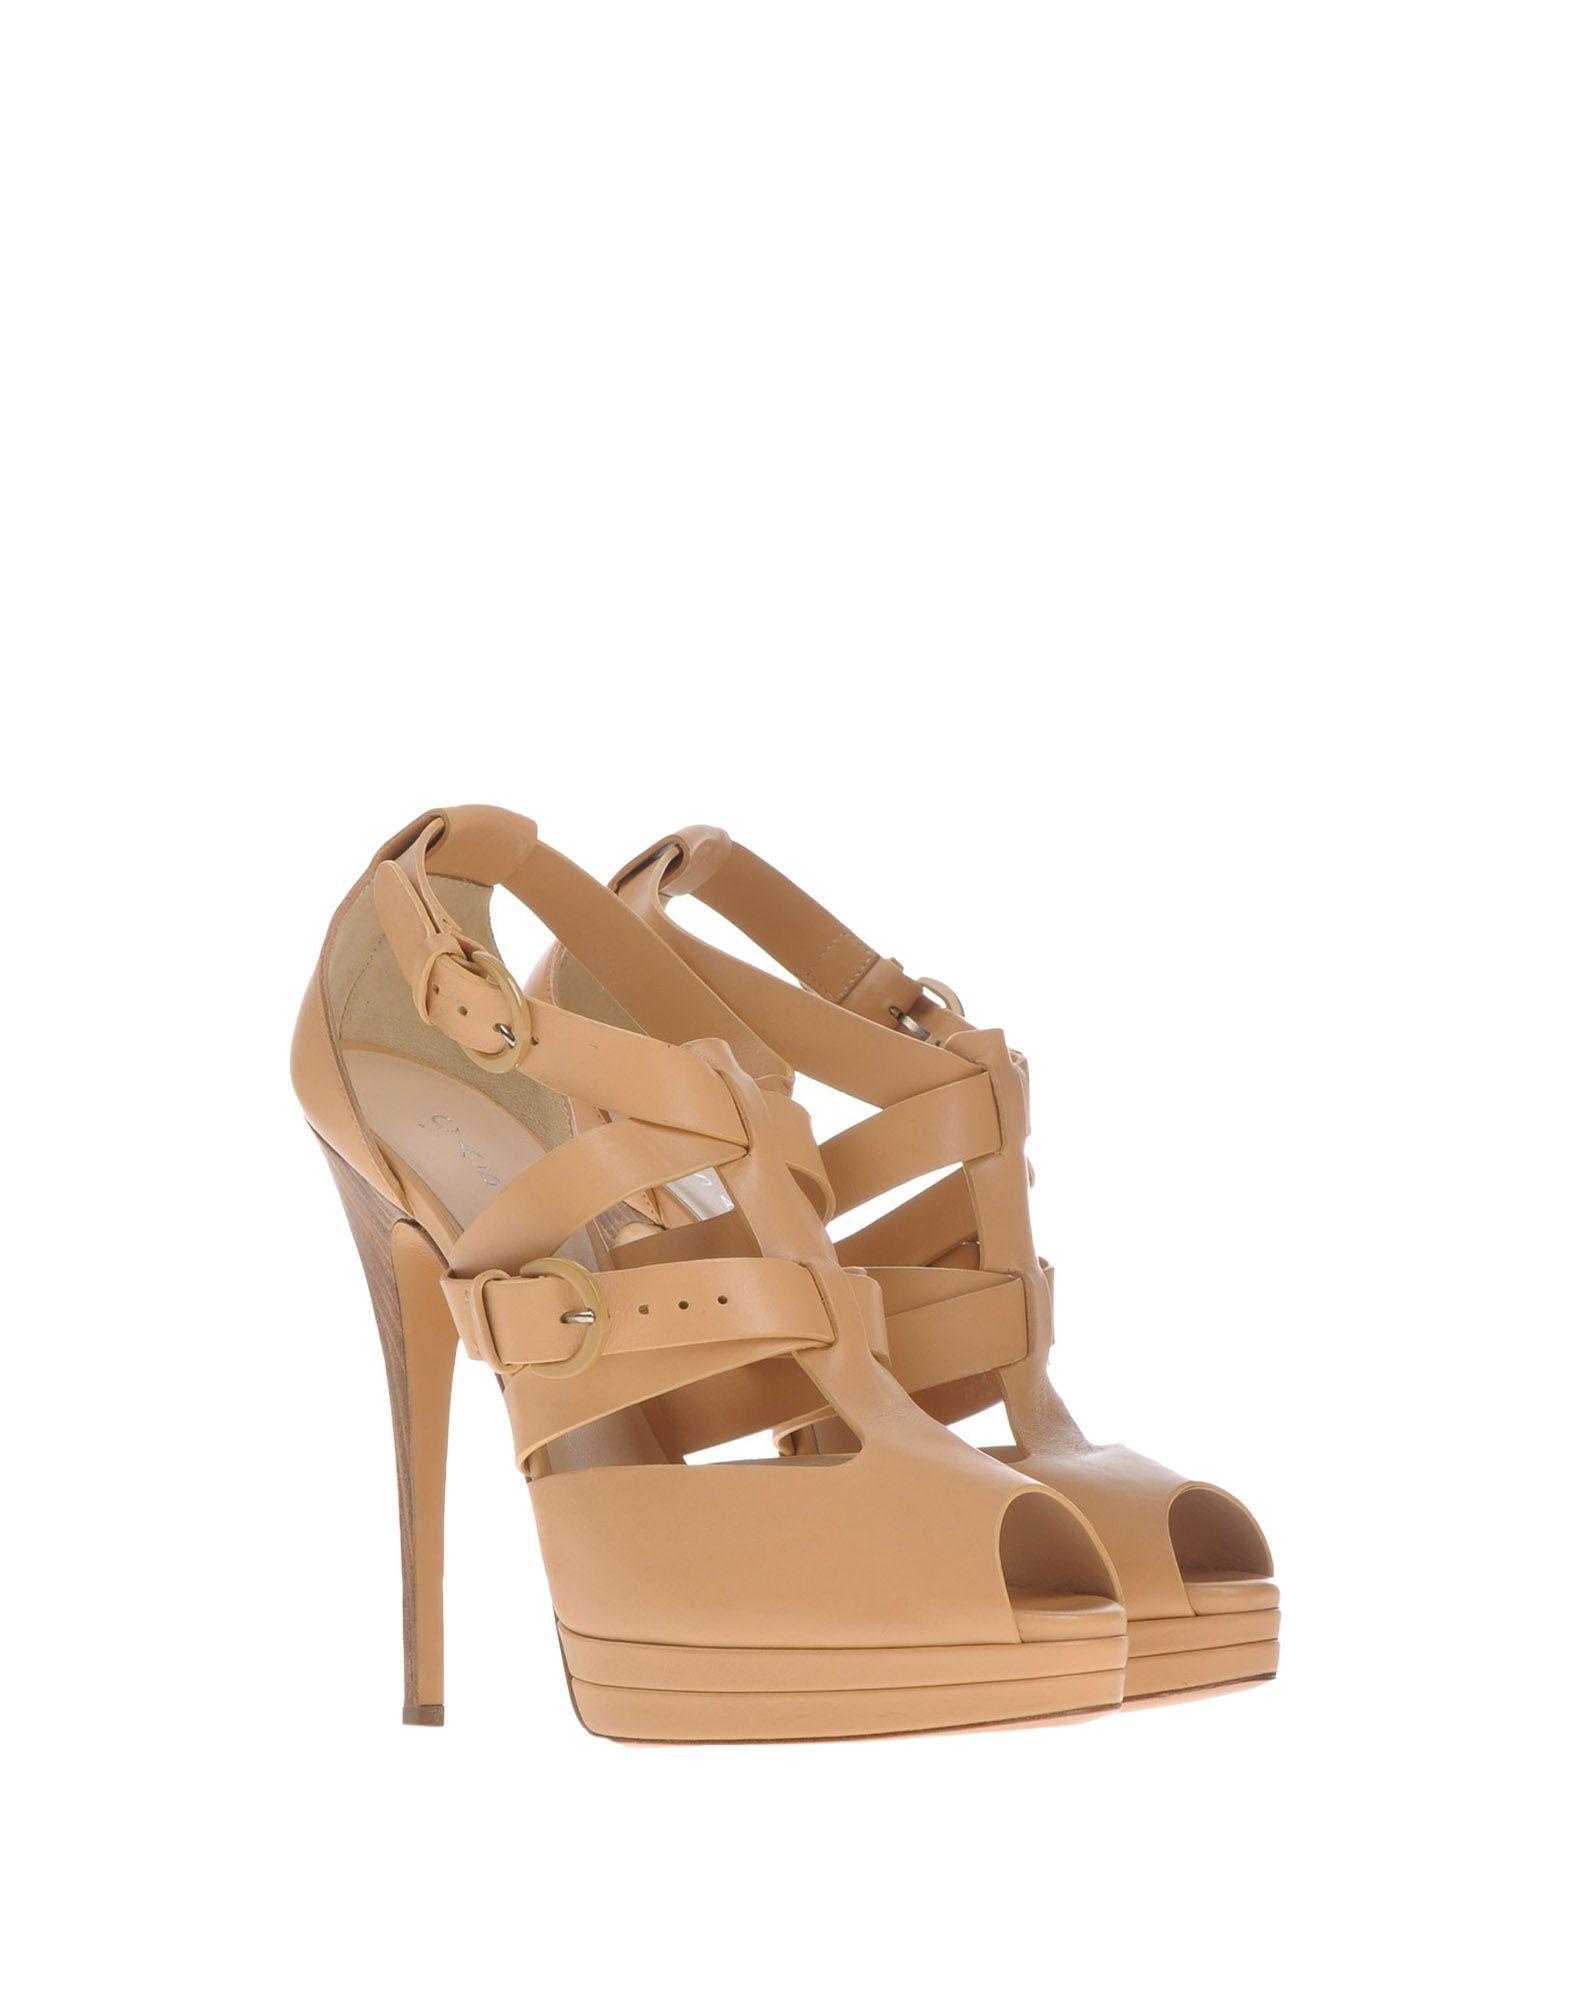 Rabatt Casadei Schuhe Casadei Rabatt Sandalen Damen  11368699AA df5fc9